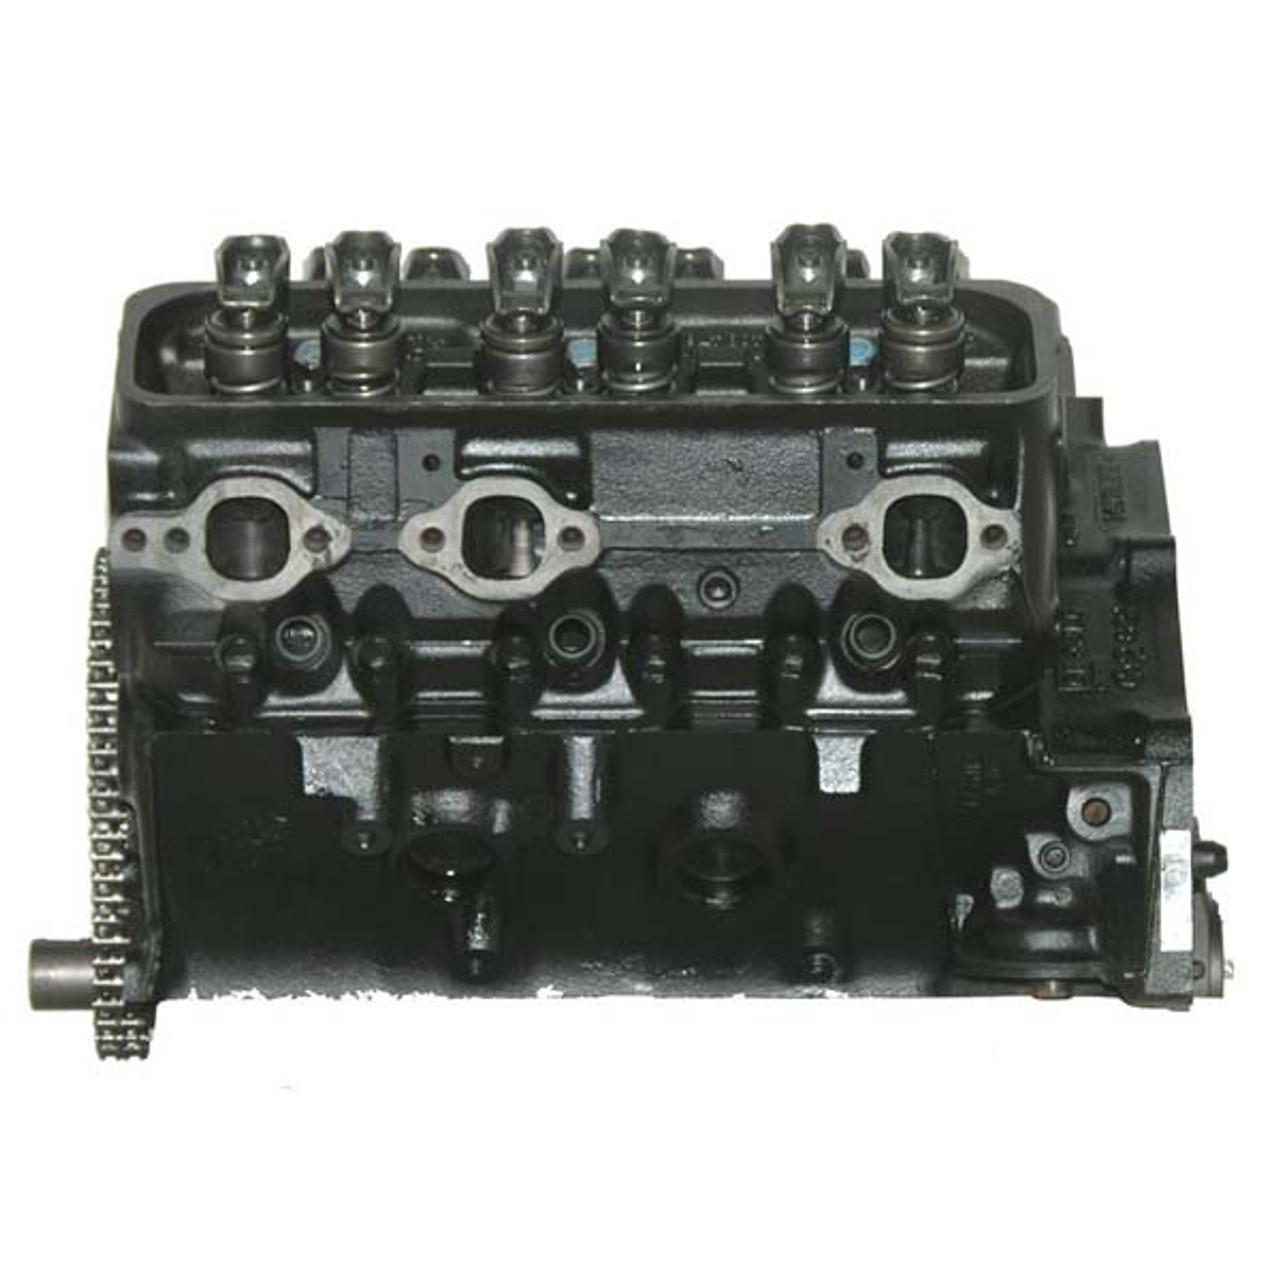 New Gm Vortec Engines